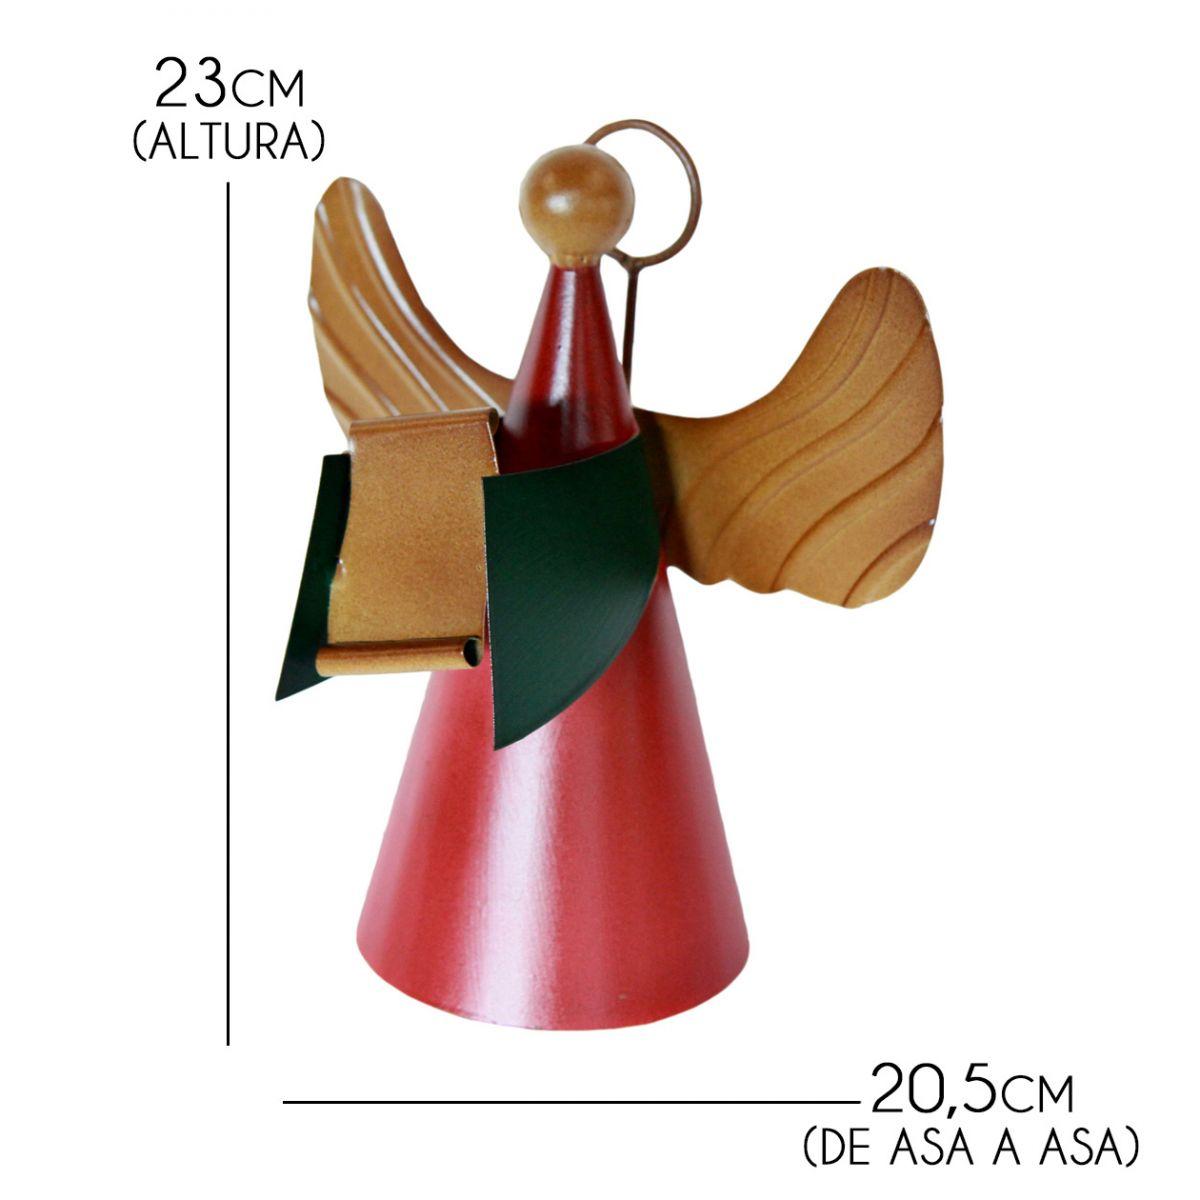 Anjo Decorativo de Natal de Ferro Artesanal para Enfeite Natalino